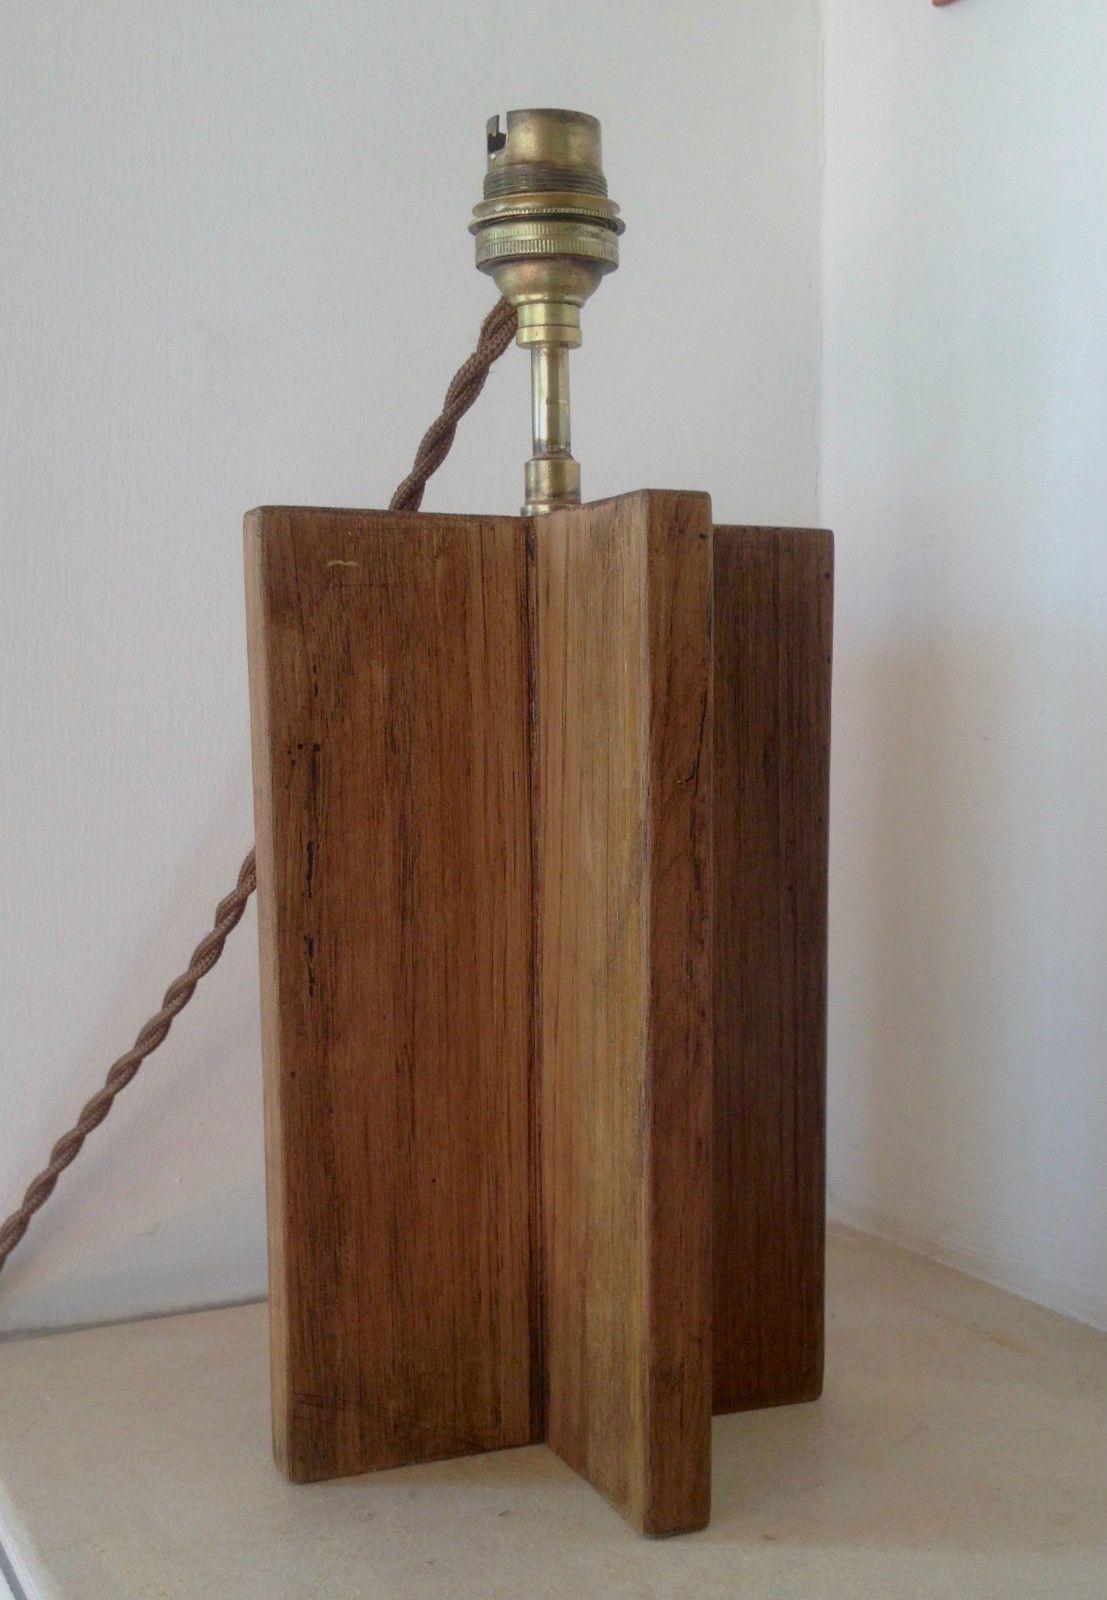 Wh wholesale vintage lead crystal table lamp buy cheap - Lampe Cruciforme Croisillon Art Deco Jean Michel Frank Modernist Lamp 30 In Art Antiquit S